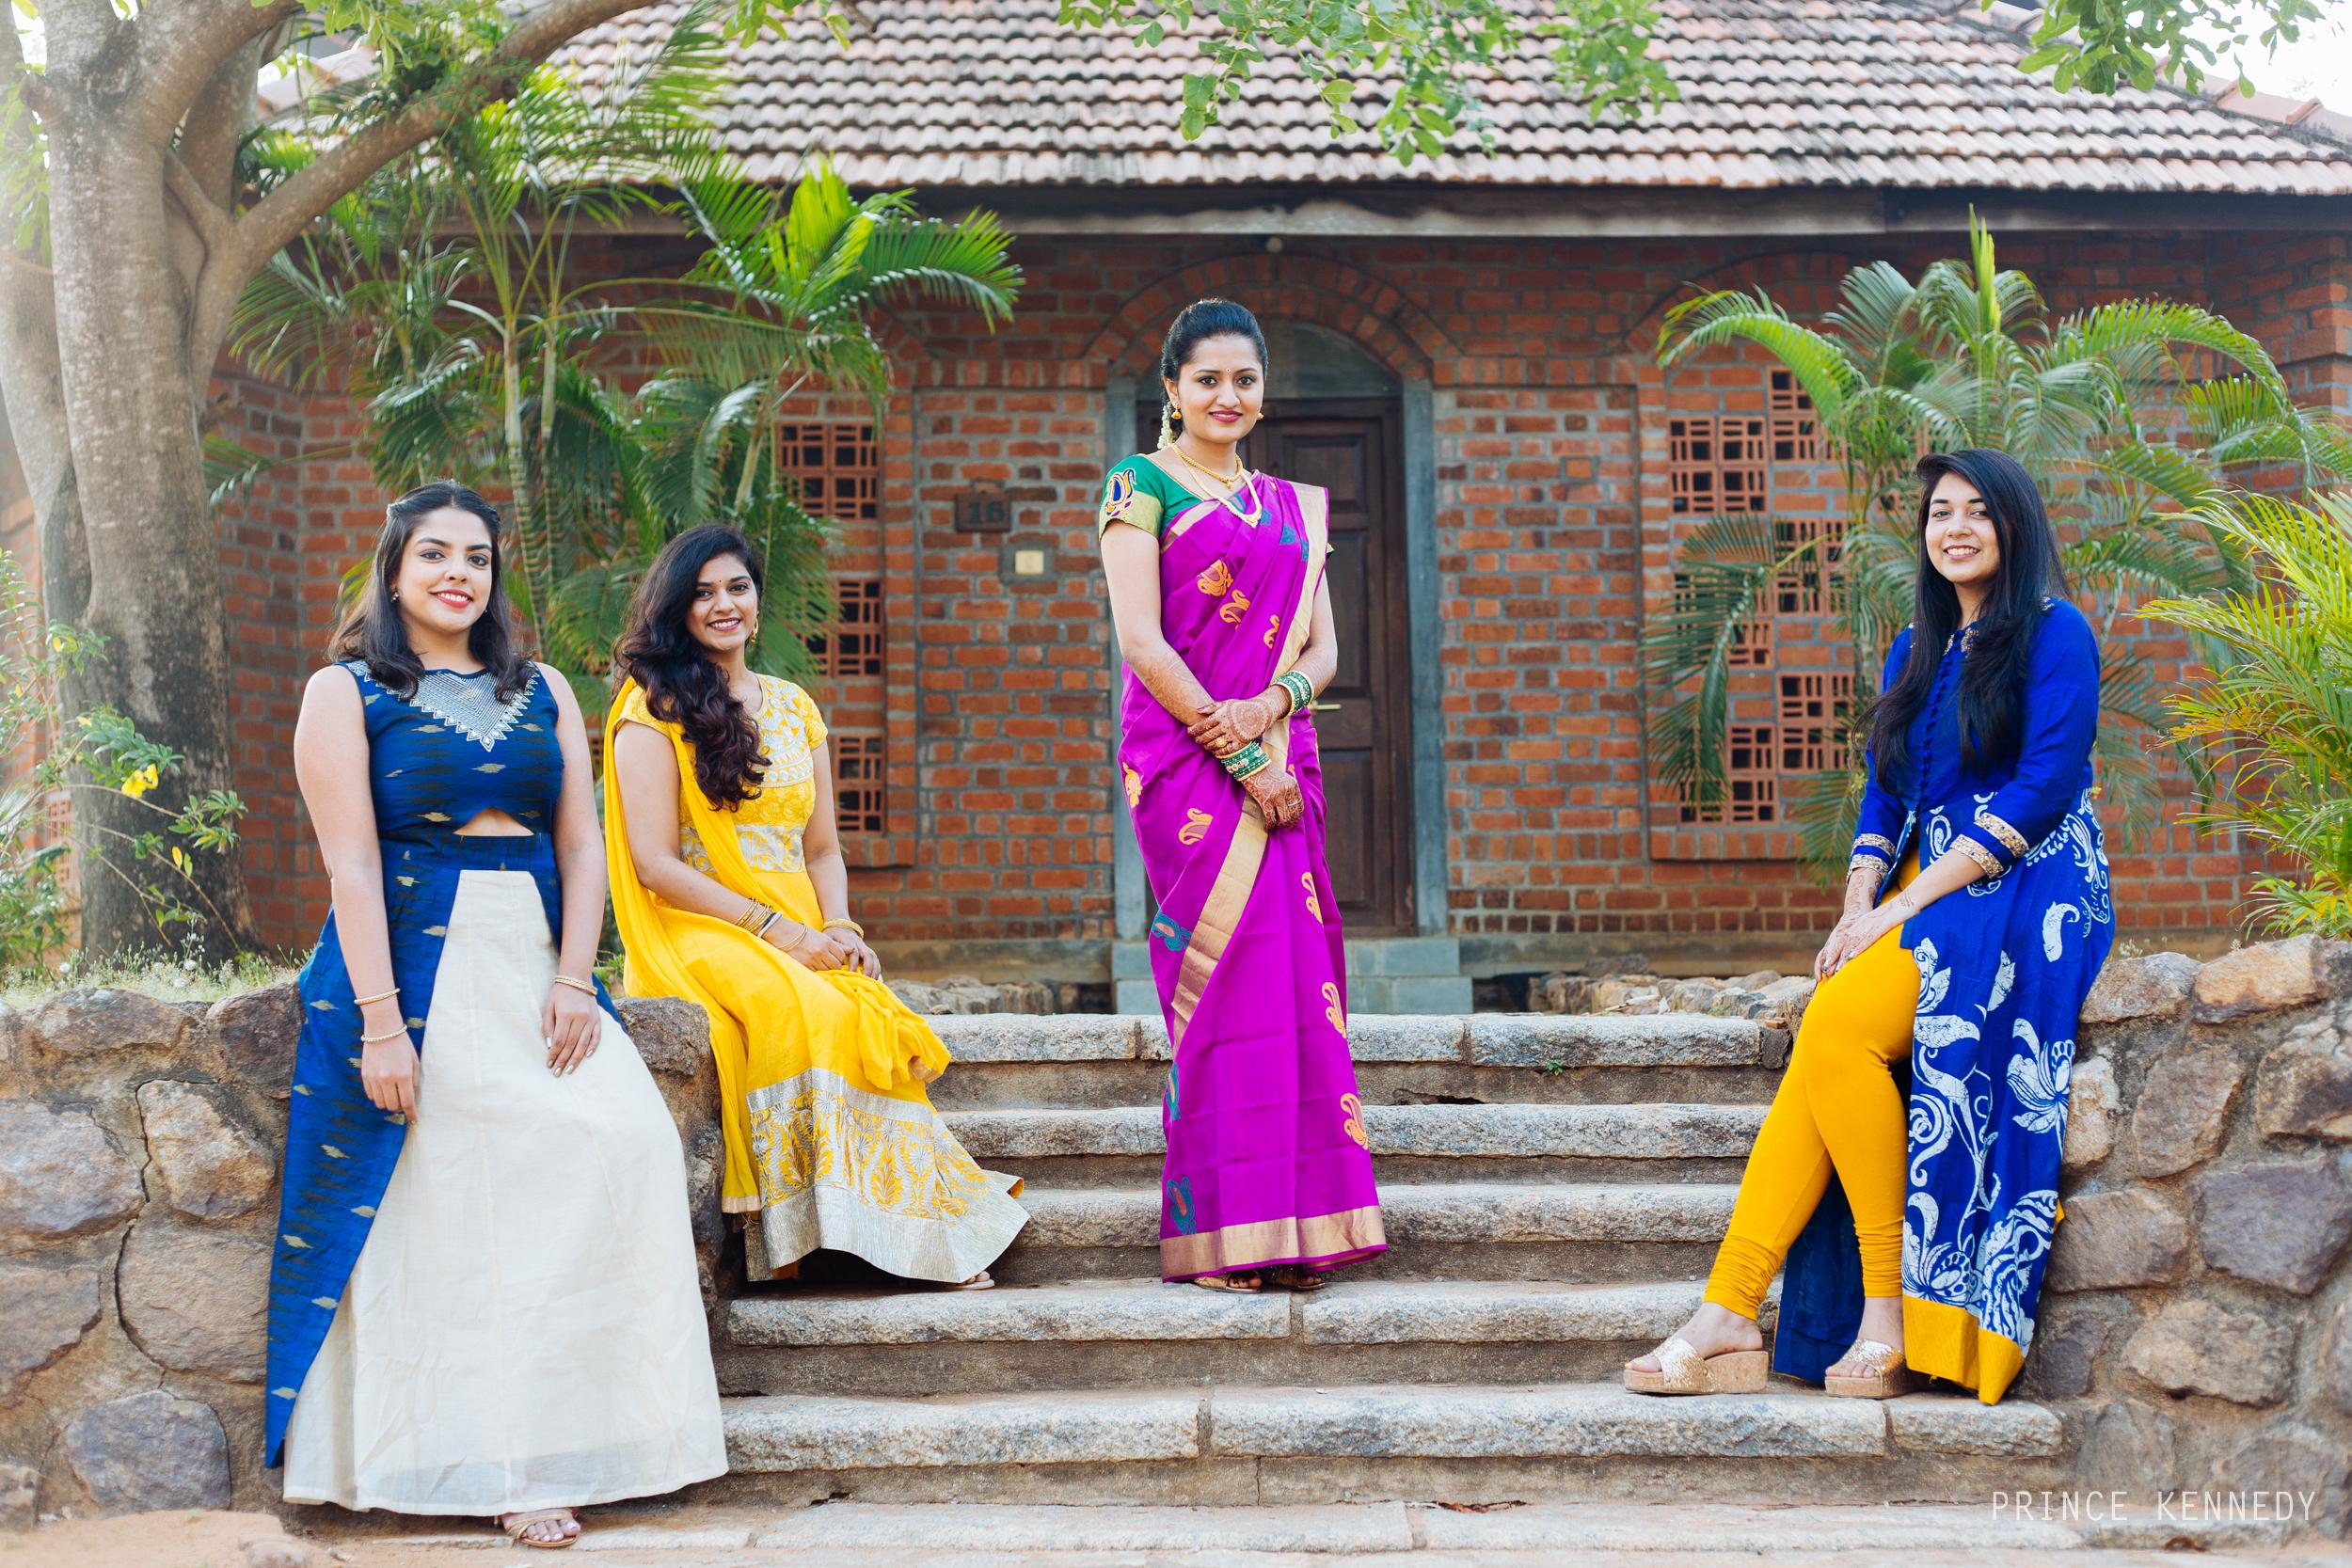 Athmajja-Nithesh-Engagement-Couple-Portrait-Portraiture-Wedding-Couple-Portrait-Chennai-Photographer-Candid-Photography-Destination-Best-Prince-Kennedy-Photography-15.jpg